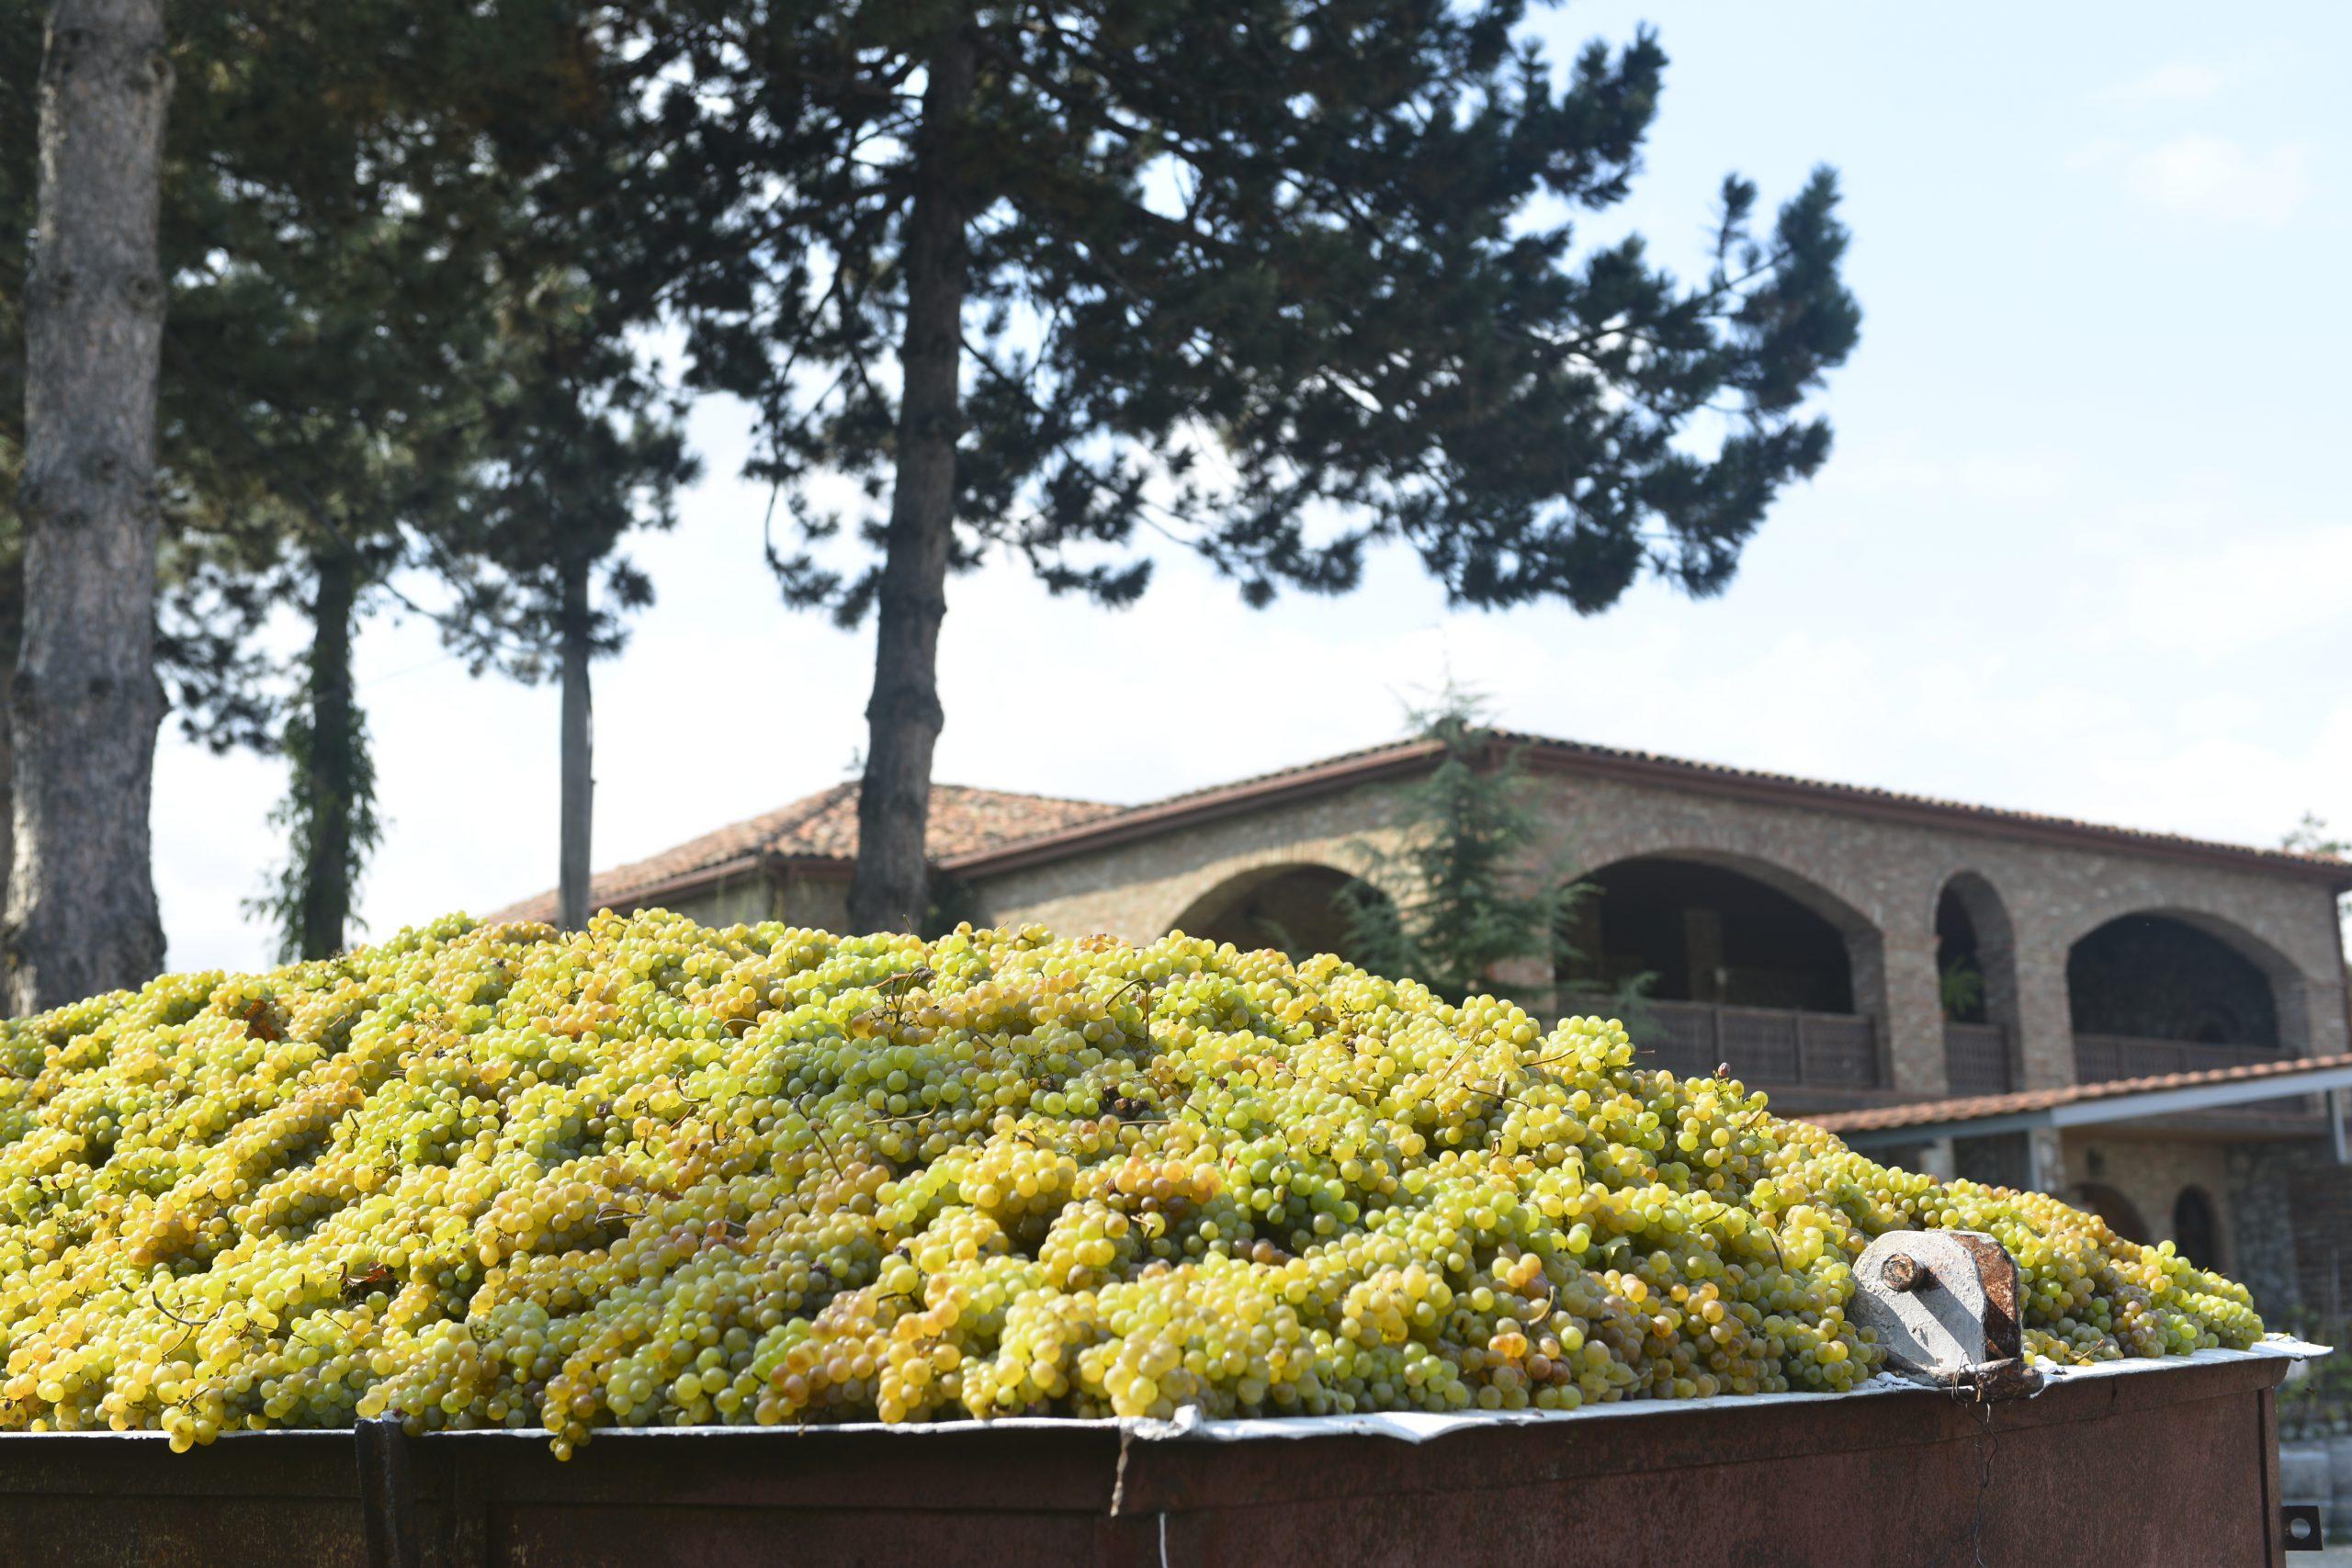 Teliani - the story behind the wine